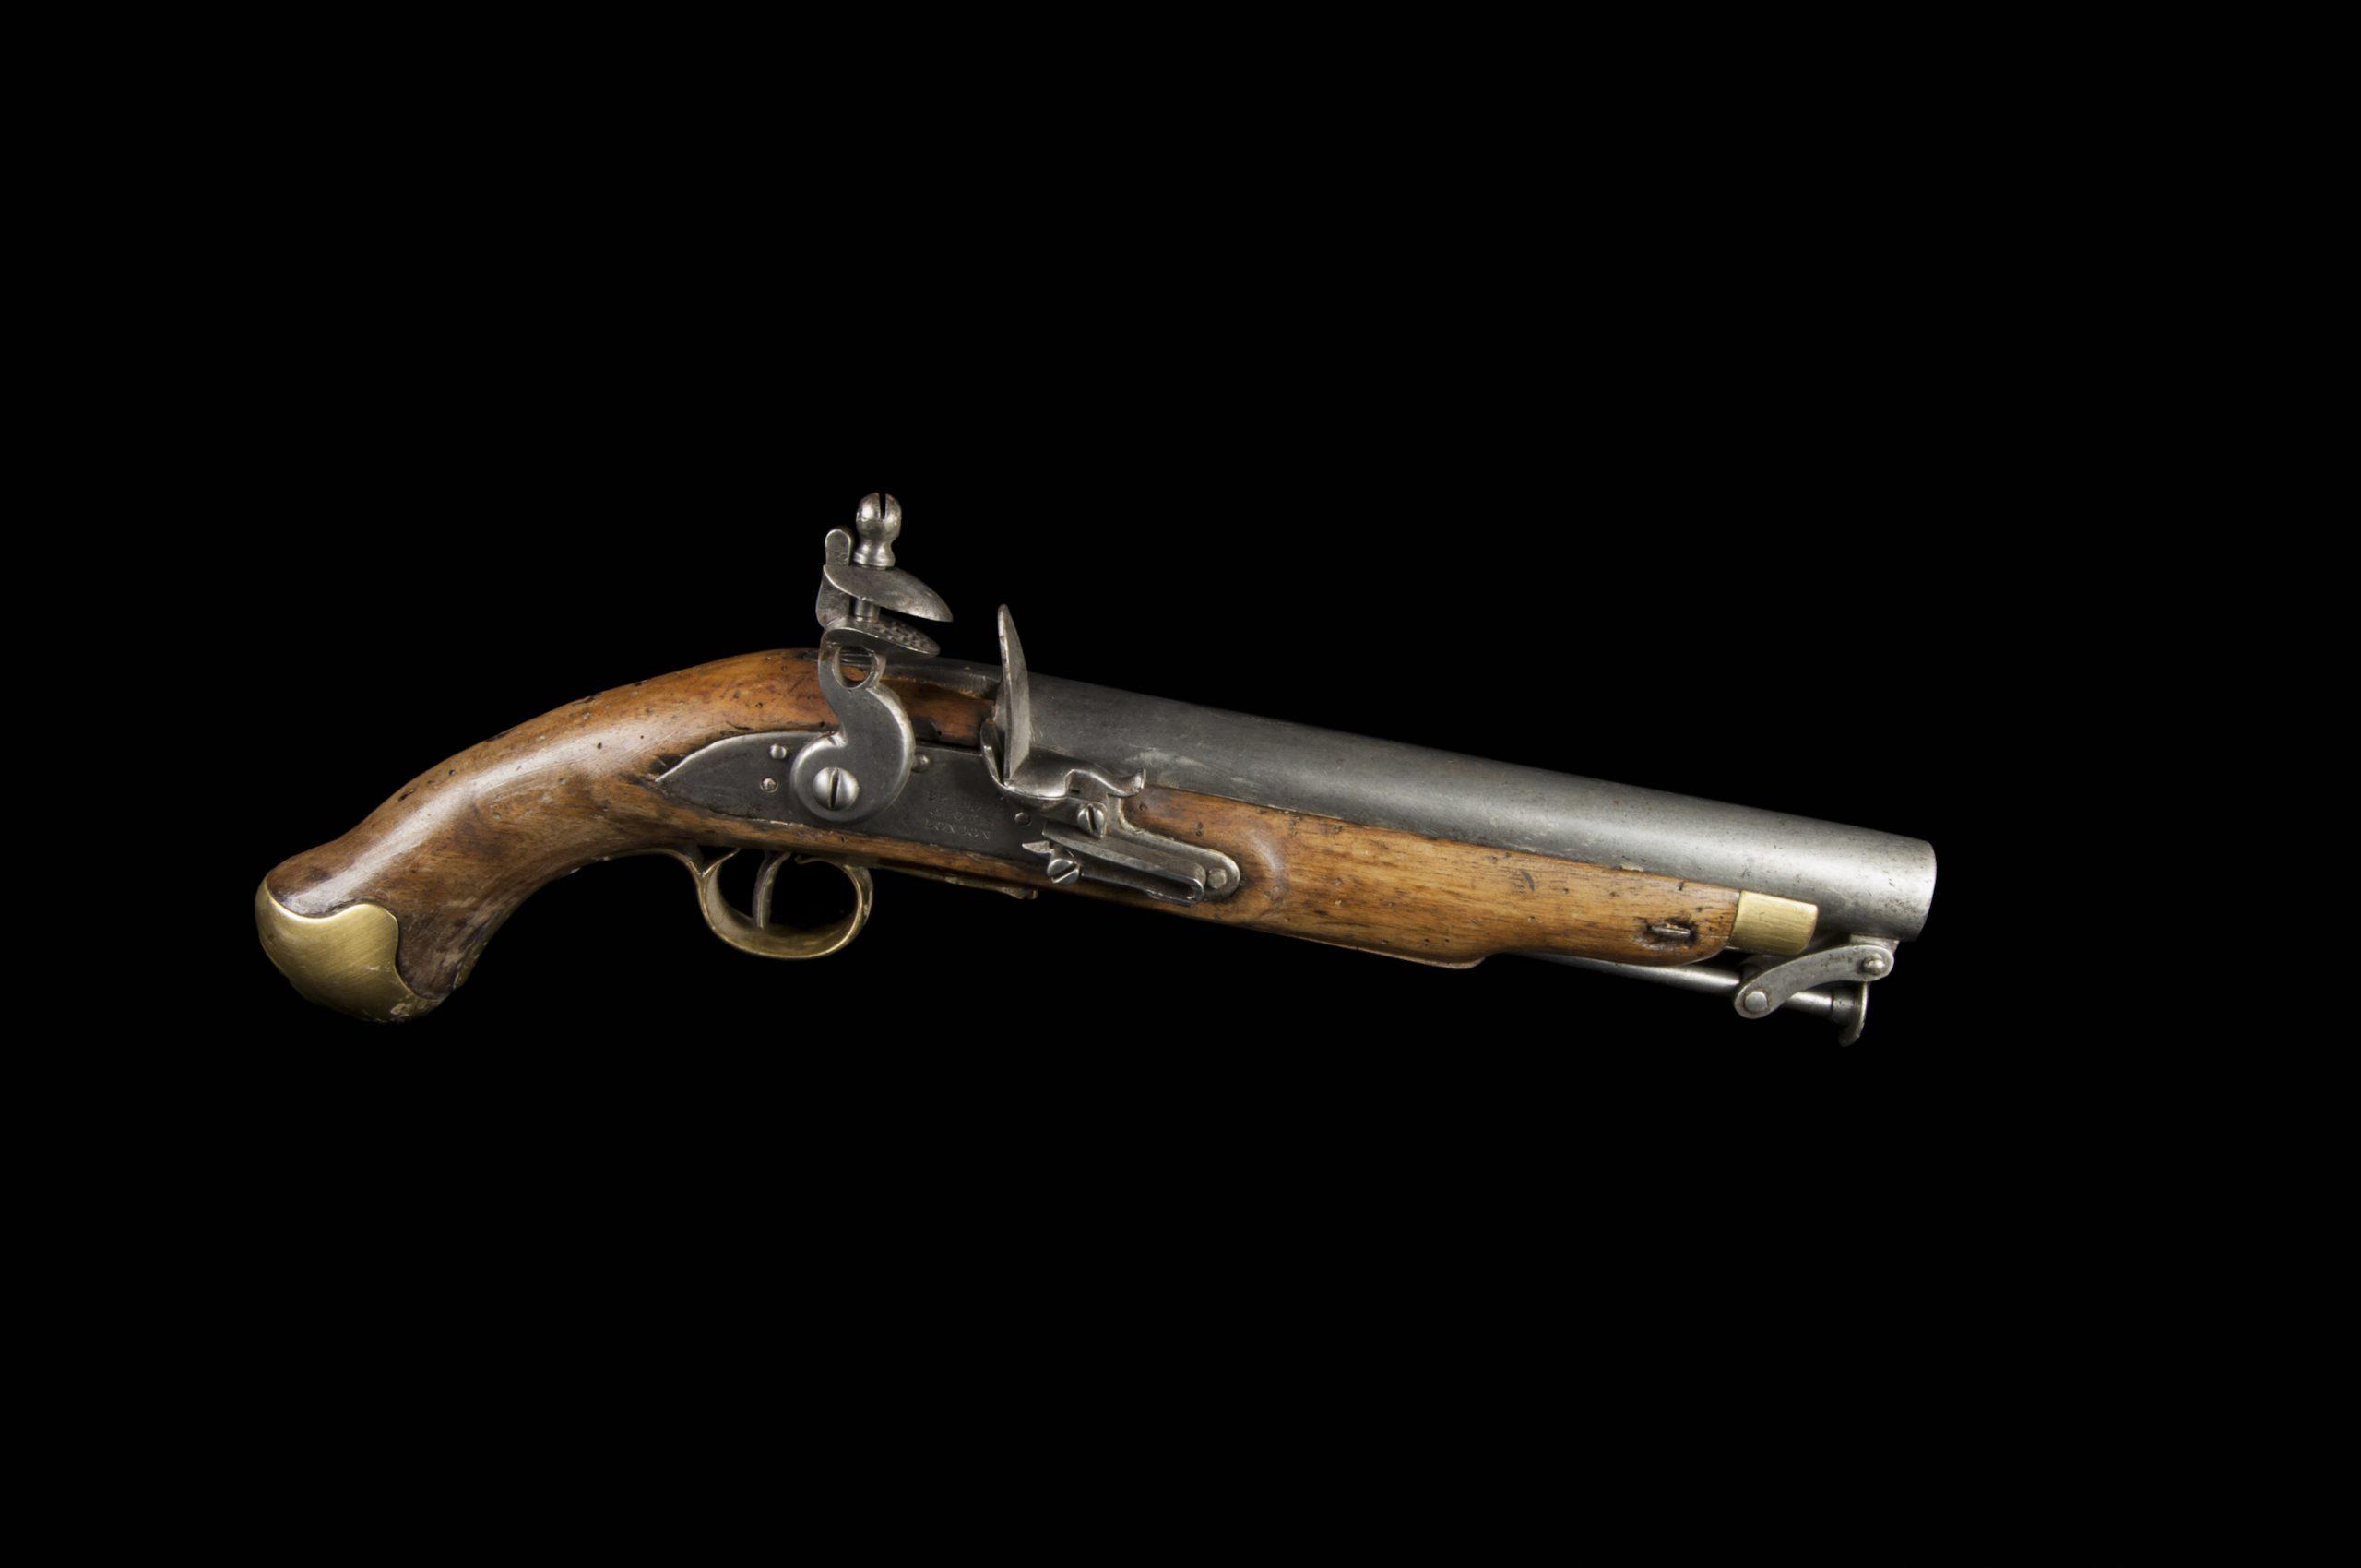 Objeto museológico (pistola)